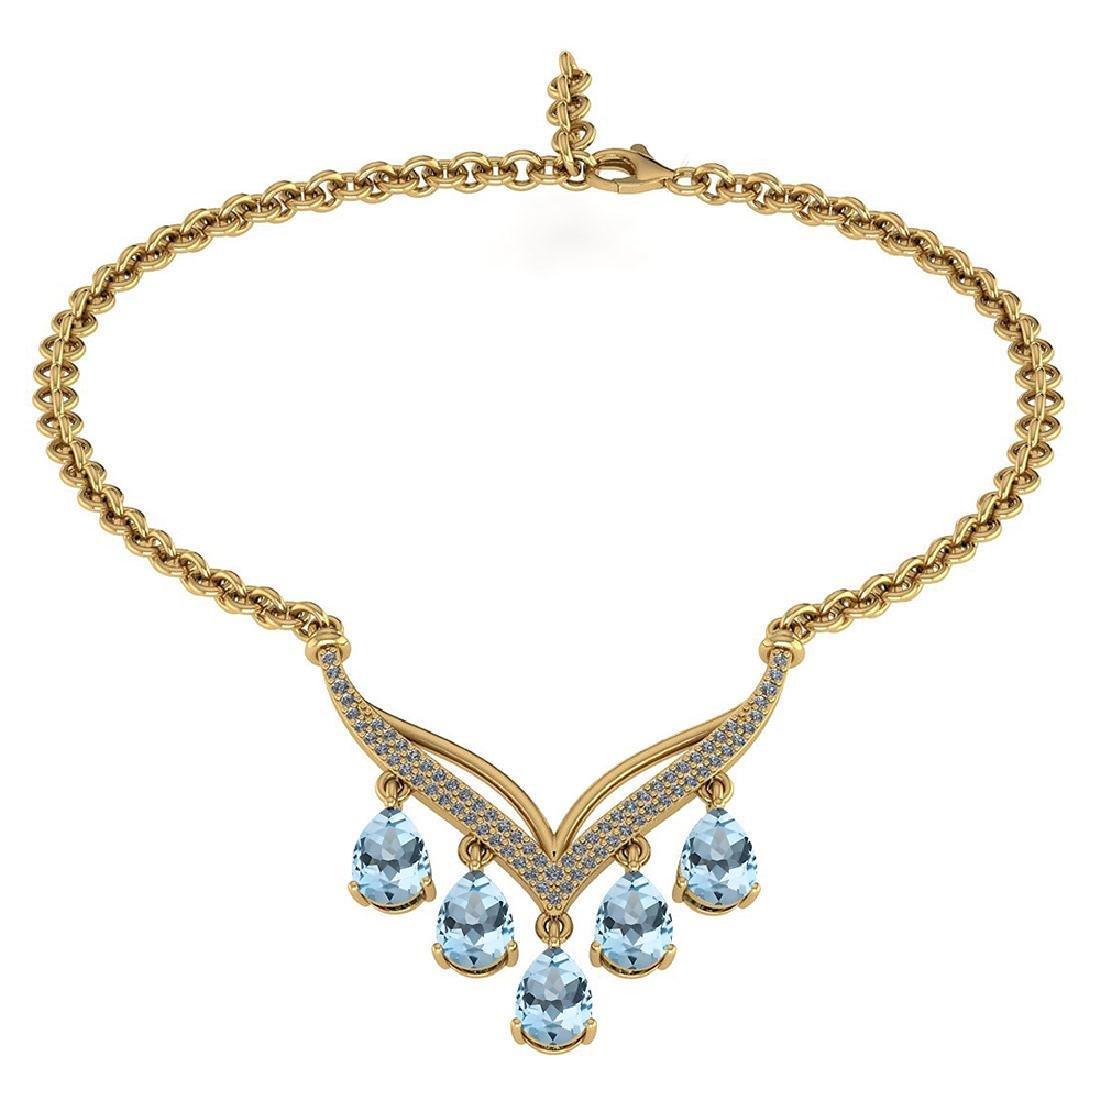 Certified 4.19 CTW Genuine Aquamarine And Diamond 14k Y